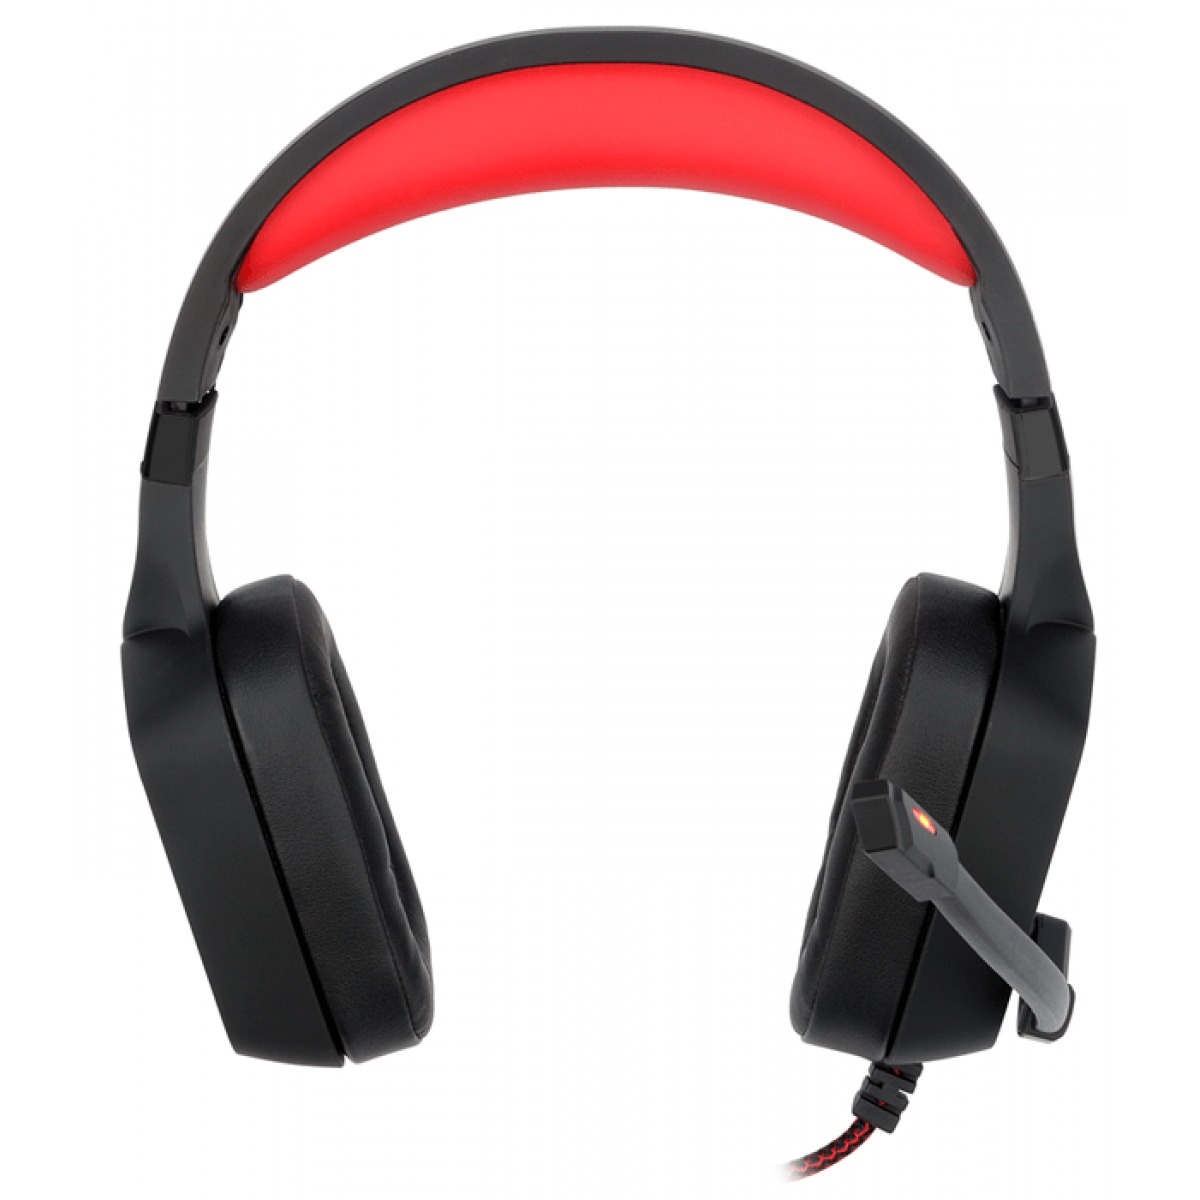 Headset Gamer Redragon Muses H310 Surround 7.1 USB Preto/Vermelho